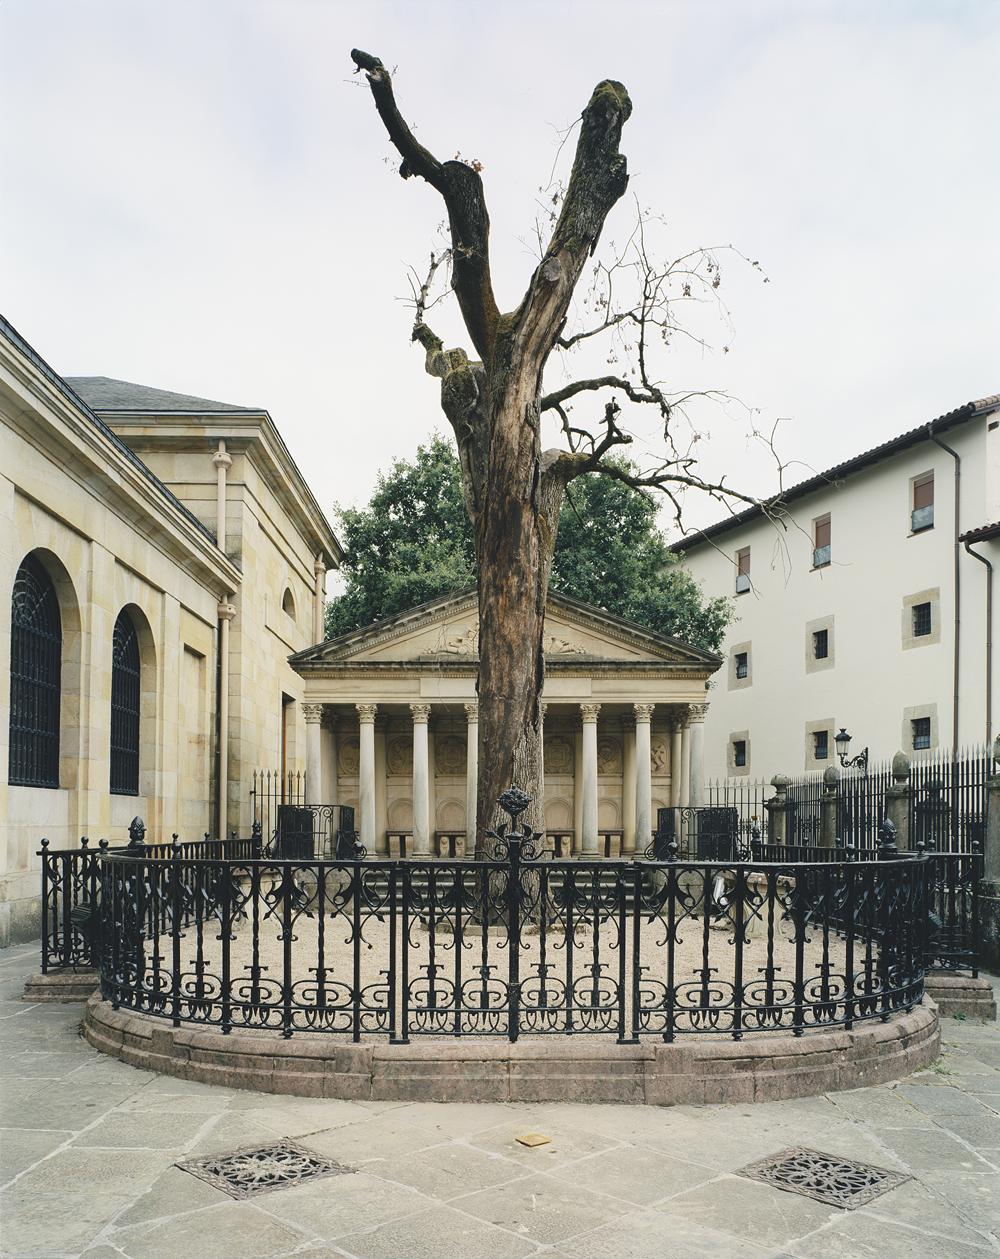 Dead tree. Gernika 2004 (2004). C Print. 125 x 175 cm.